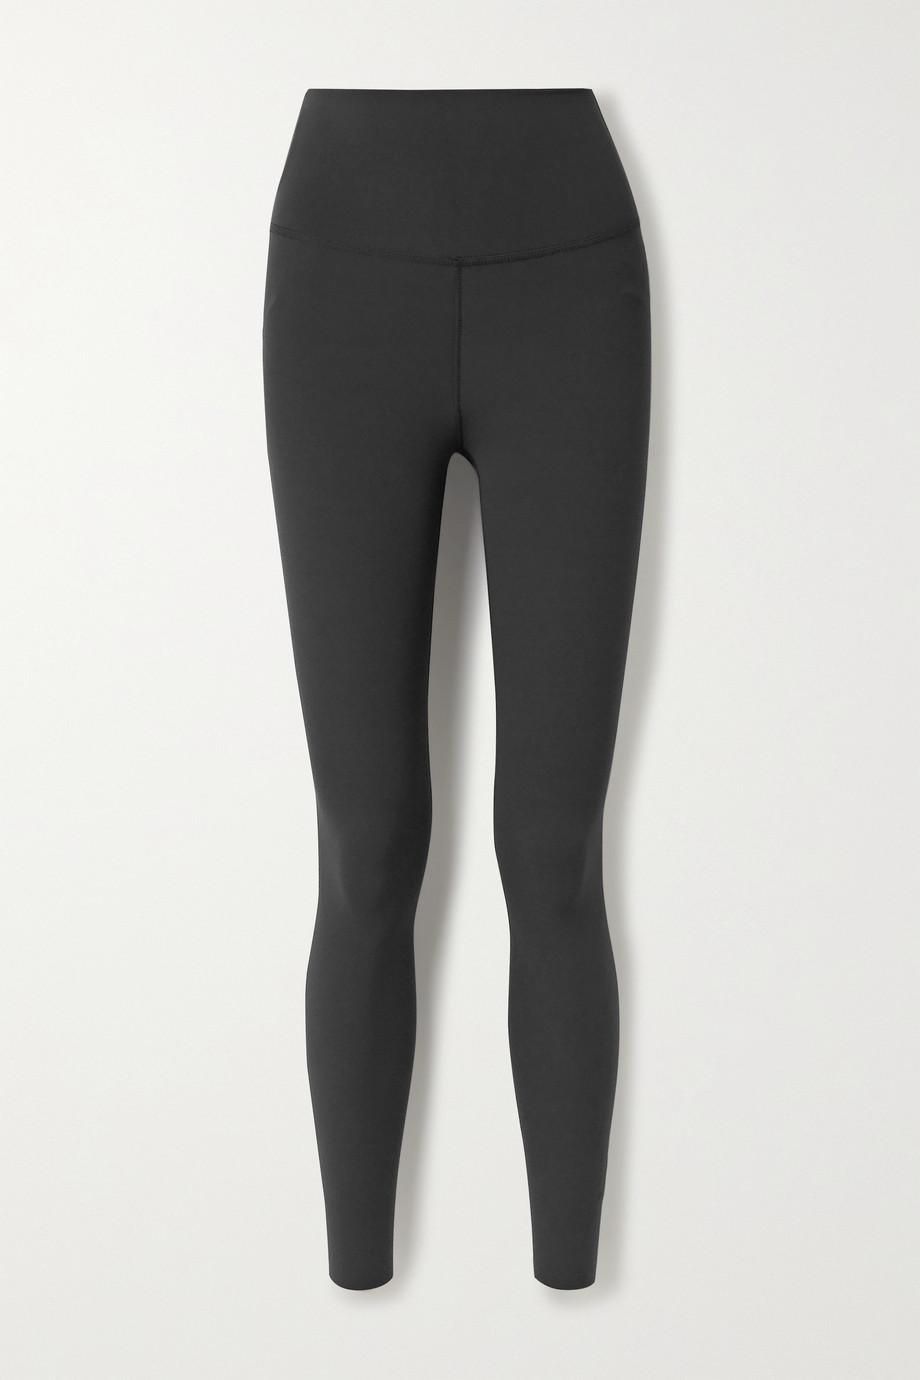 Nike Yoga Luxe cropped Dri-FIT leggings